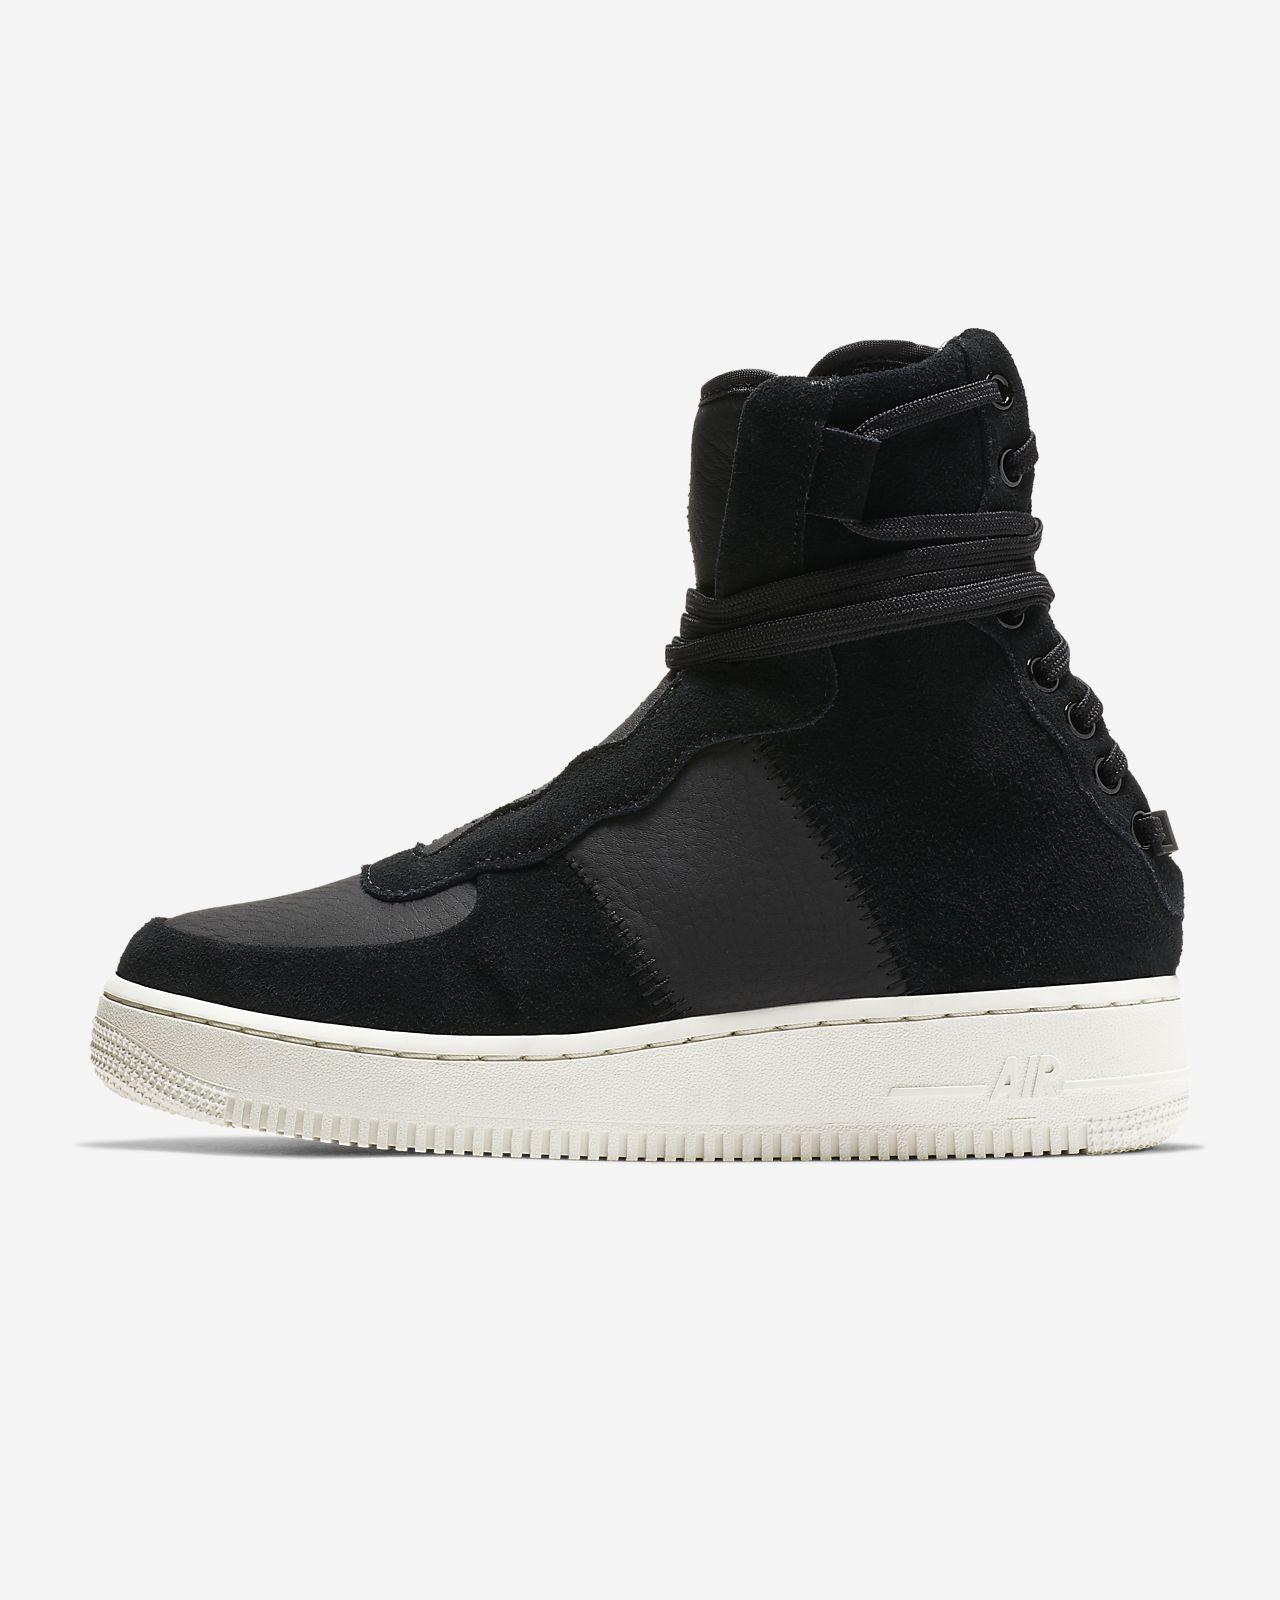 Dámská bota Nike Air Force 1 Rebel XX Premium